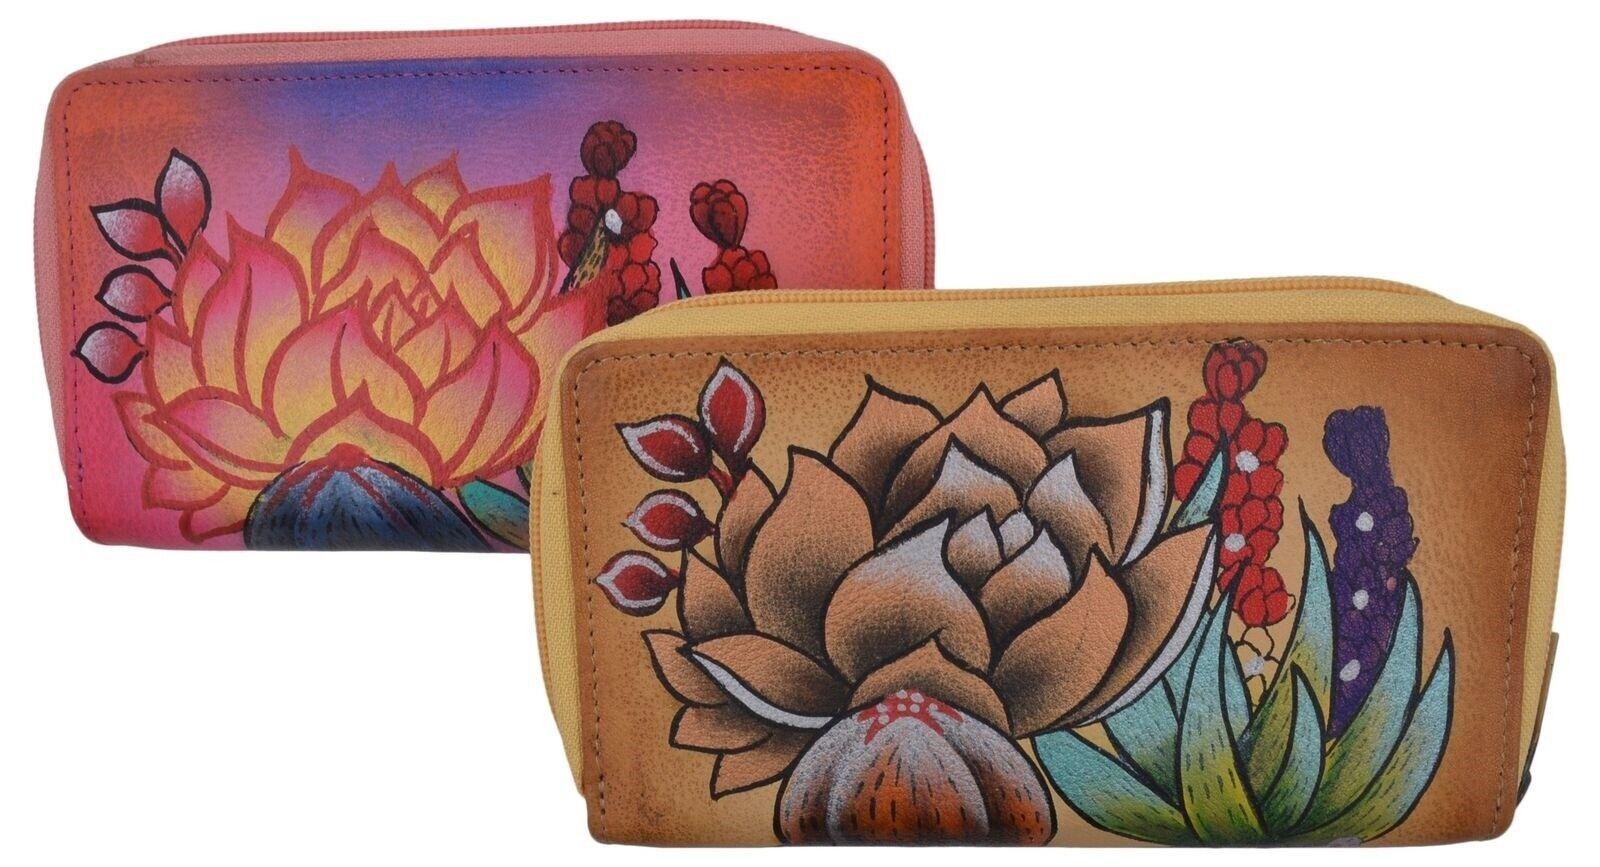 New Handpainted Ladies Wild Flowers Design Leather Double Zipper Womens Wallet